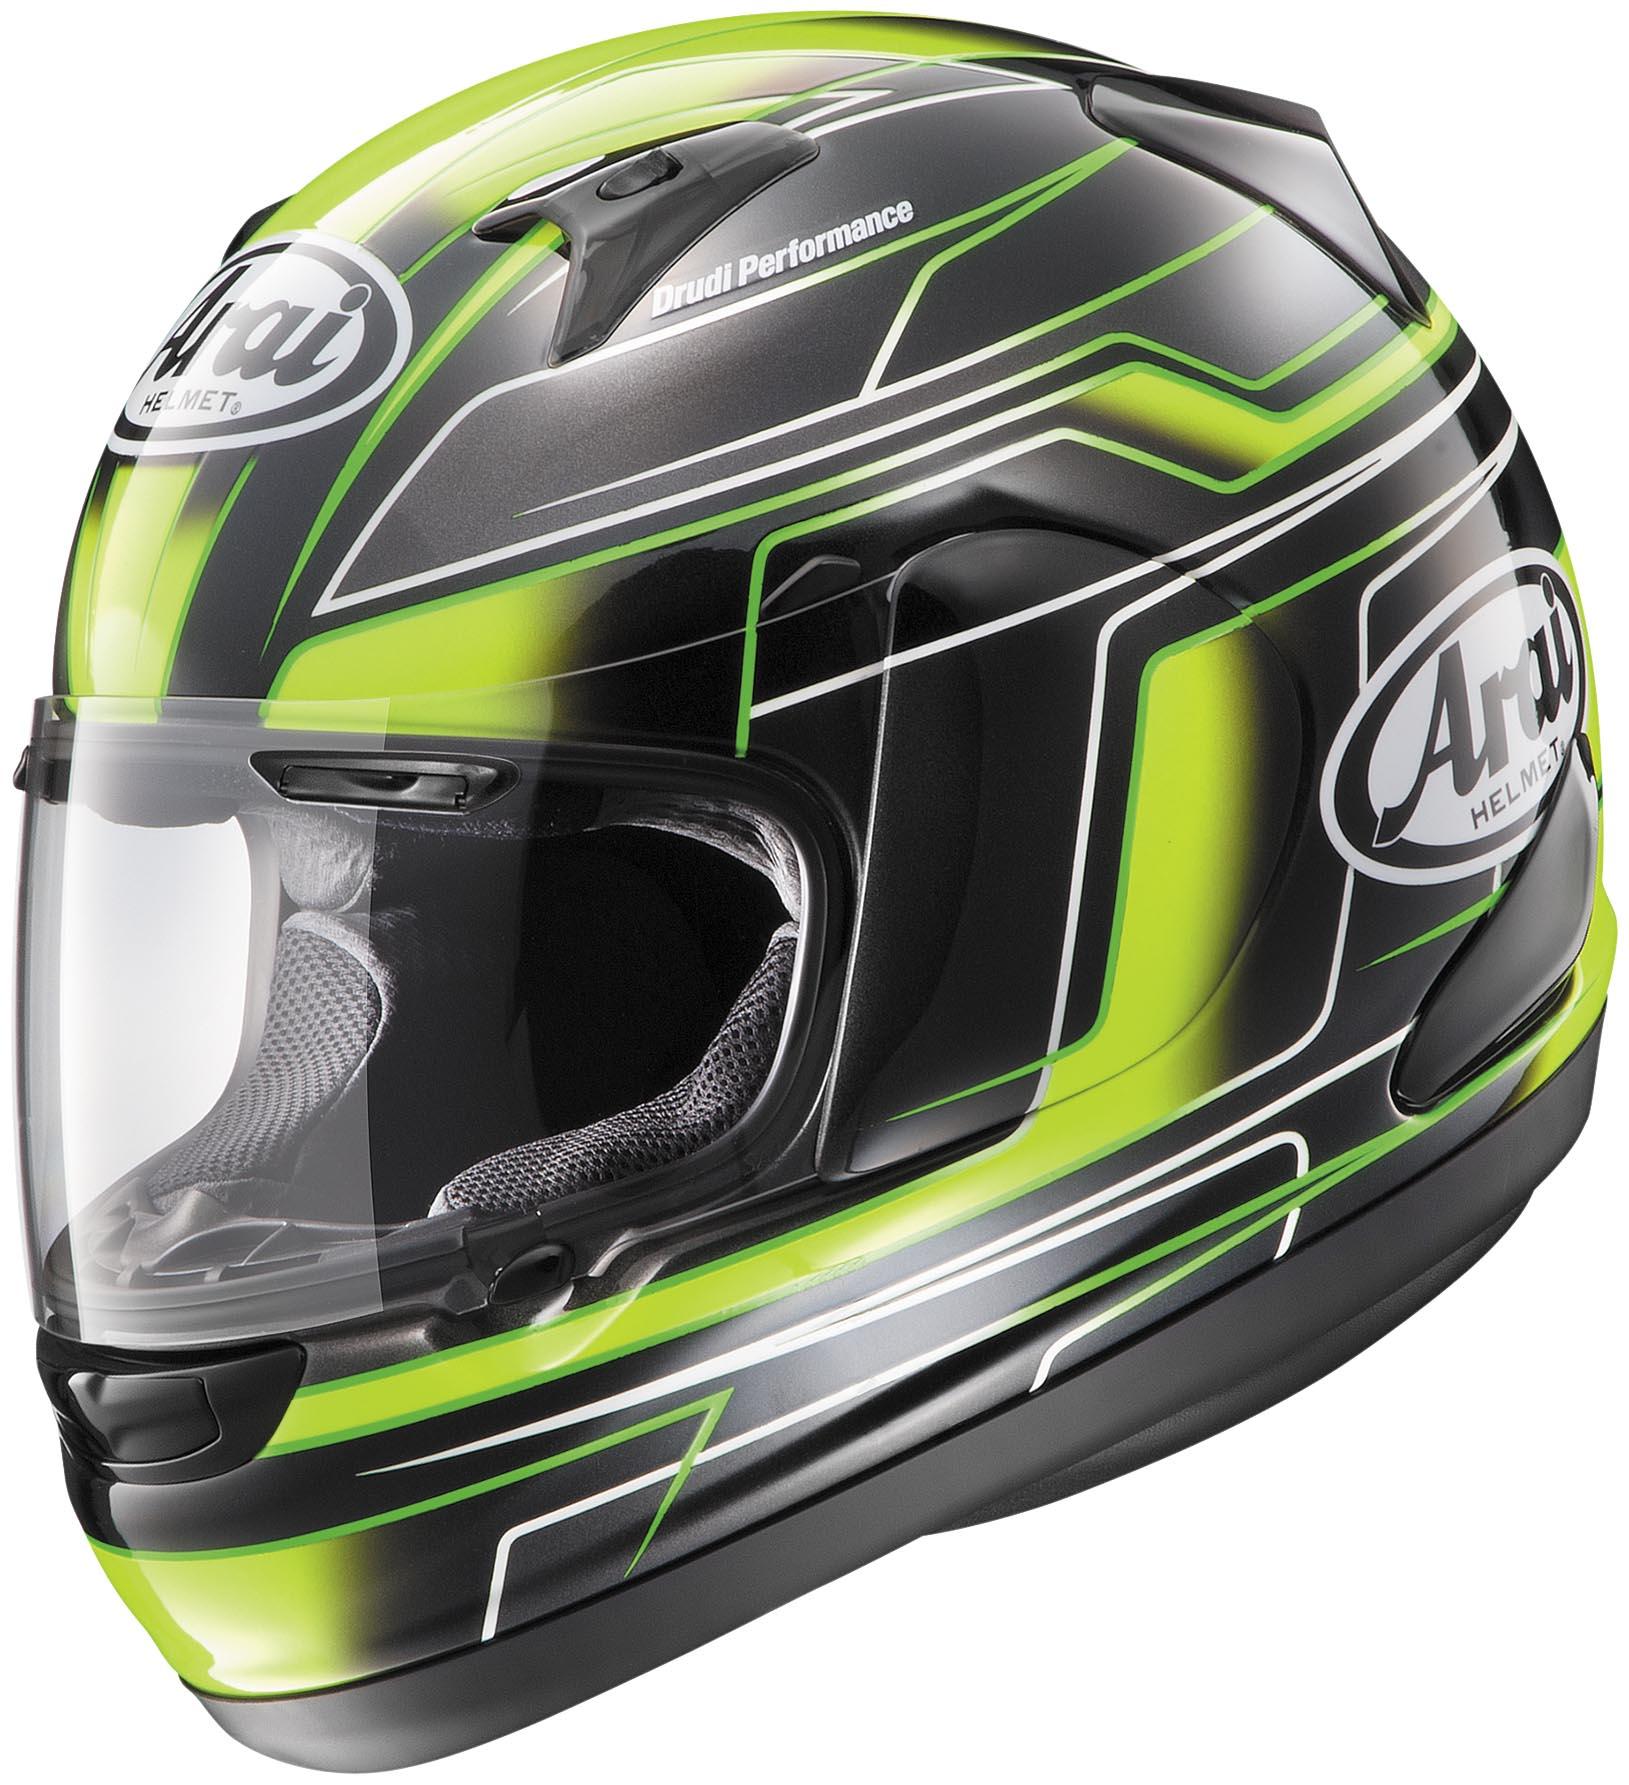 ... & Accessories > Apparel & Merchandise > Helmets & Headw...